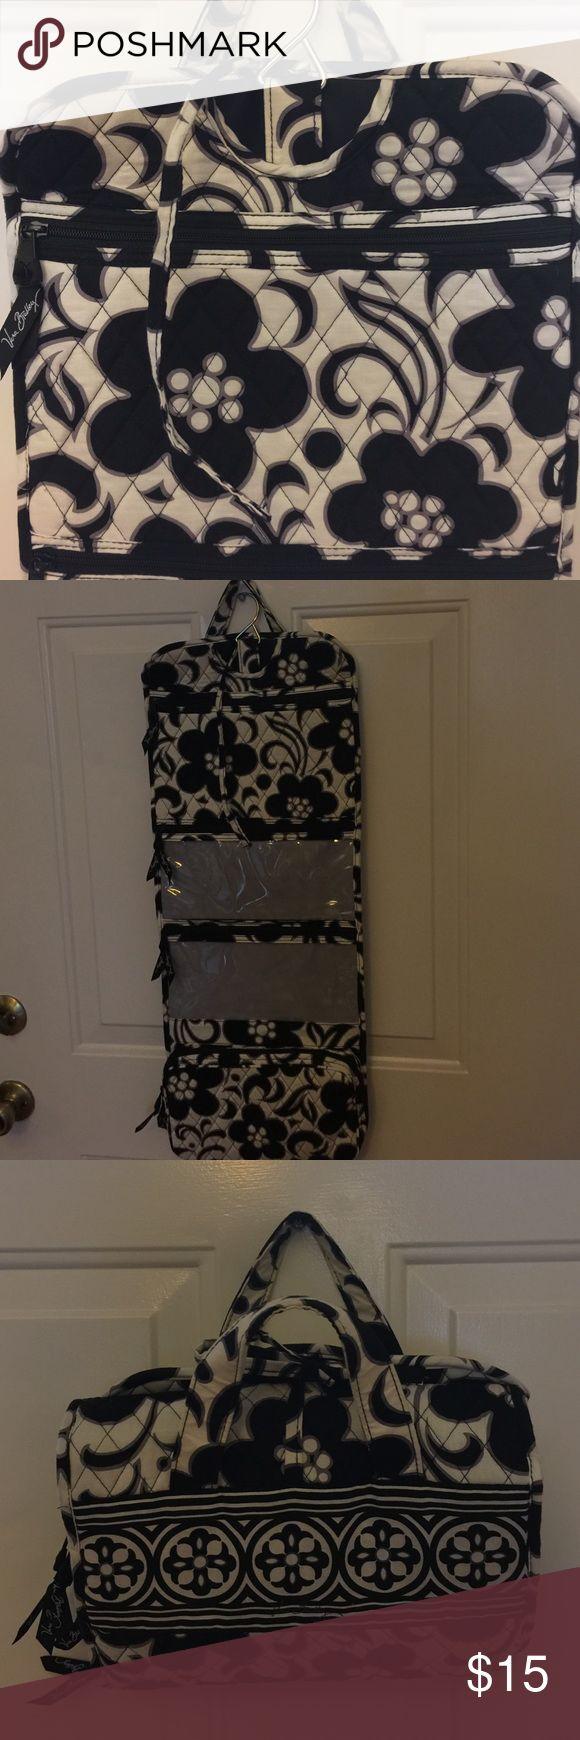 New Listing! 🙋. Vera Bradley travel organizer! Like new beautiful Vera Bradley black and white hanging travel organizer! Vera Bradley Bags Travel Bags